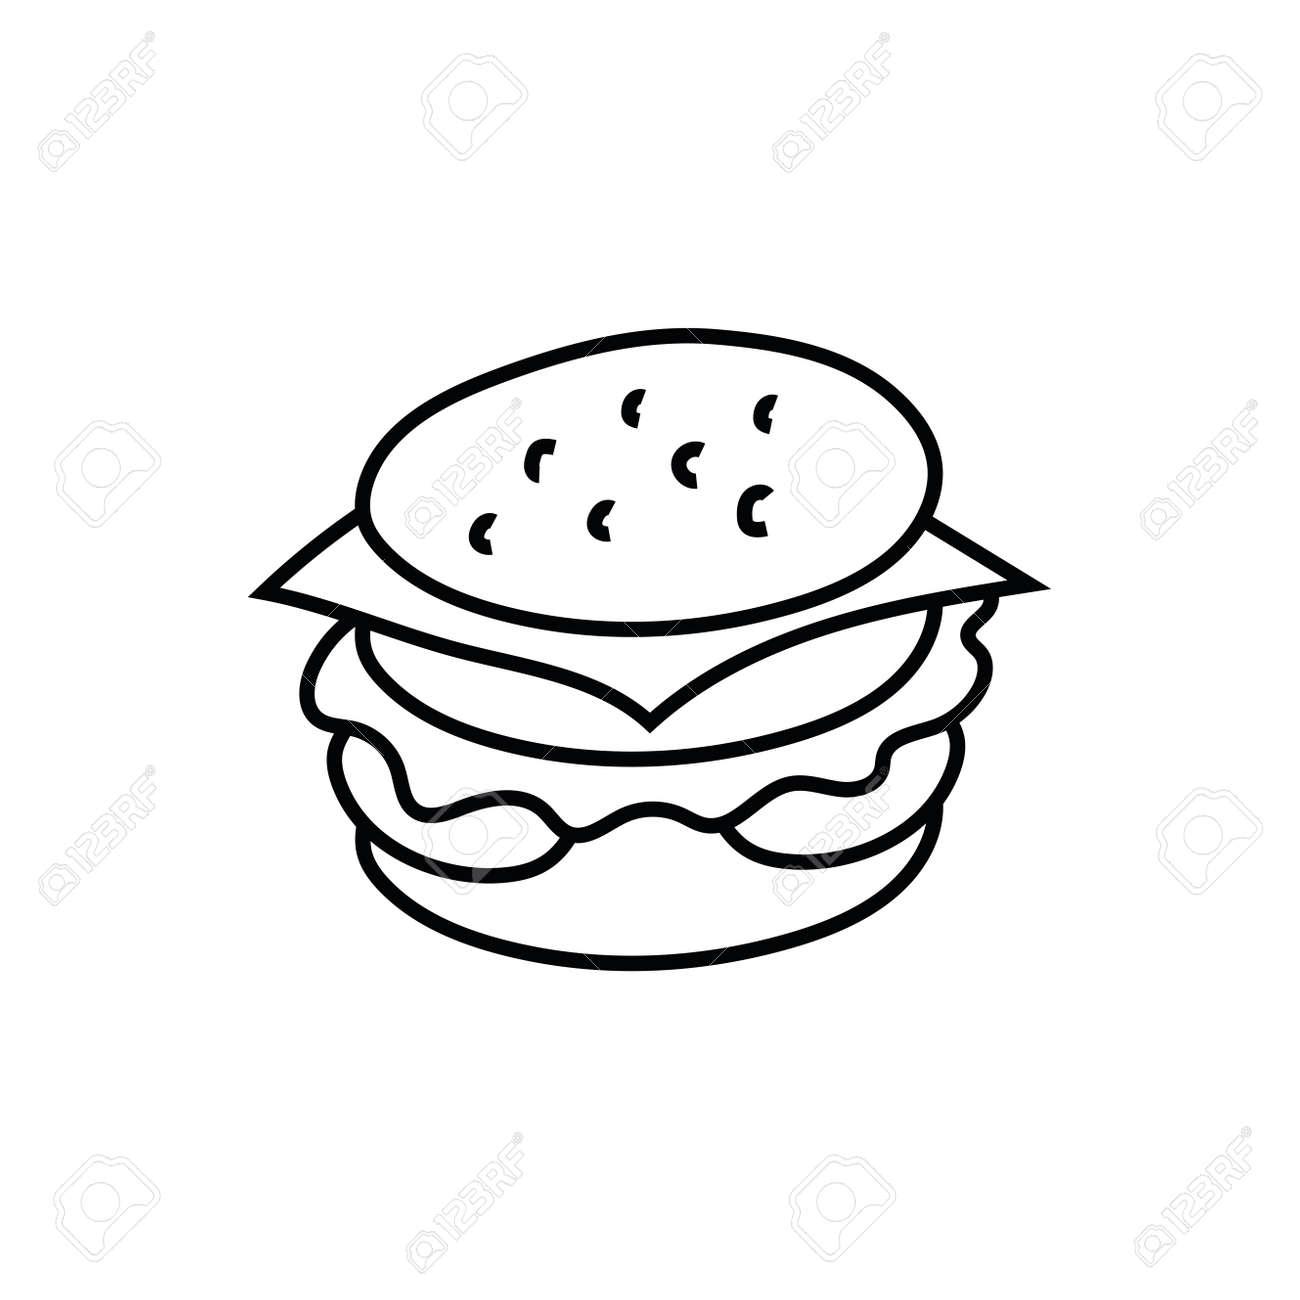 delicious burger fast food icon vector illustration design - 155254605